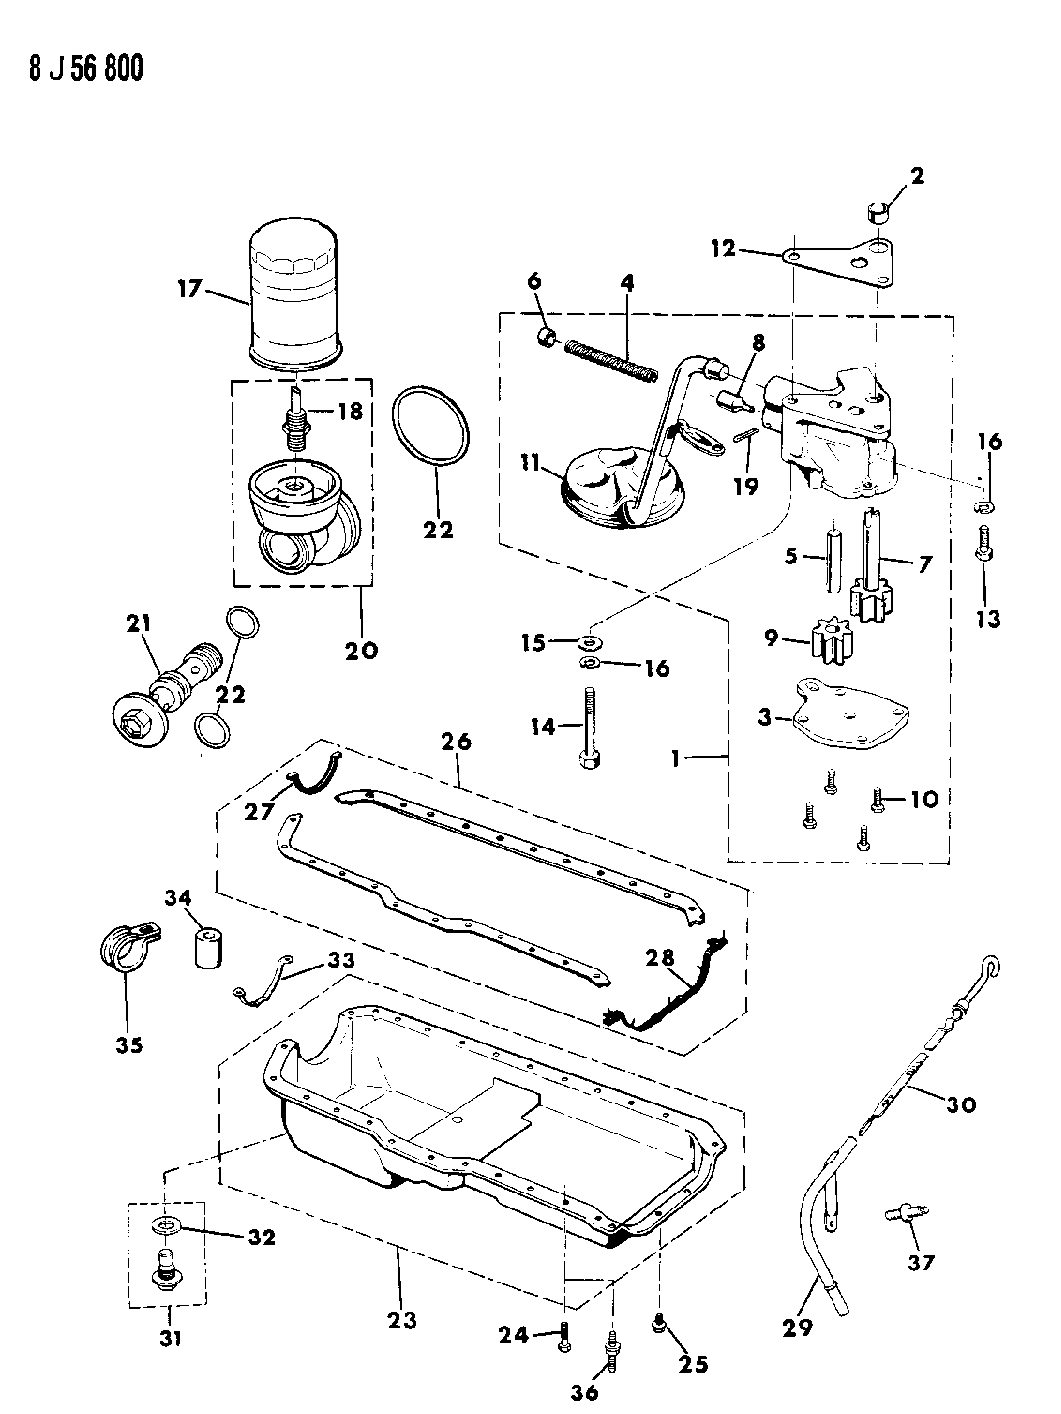 jeep 3 0 engine diagram 33002787 genuine mopar cover oil filter  33002787 genuine mopar cover oil filter